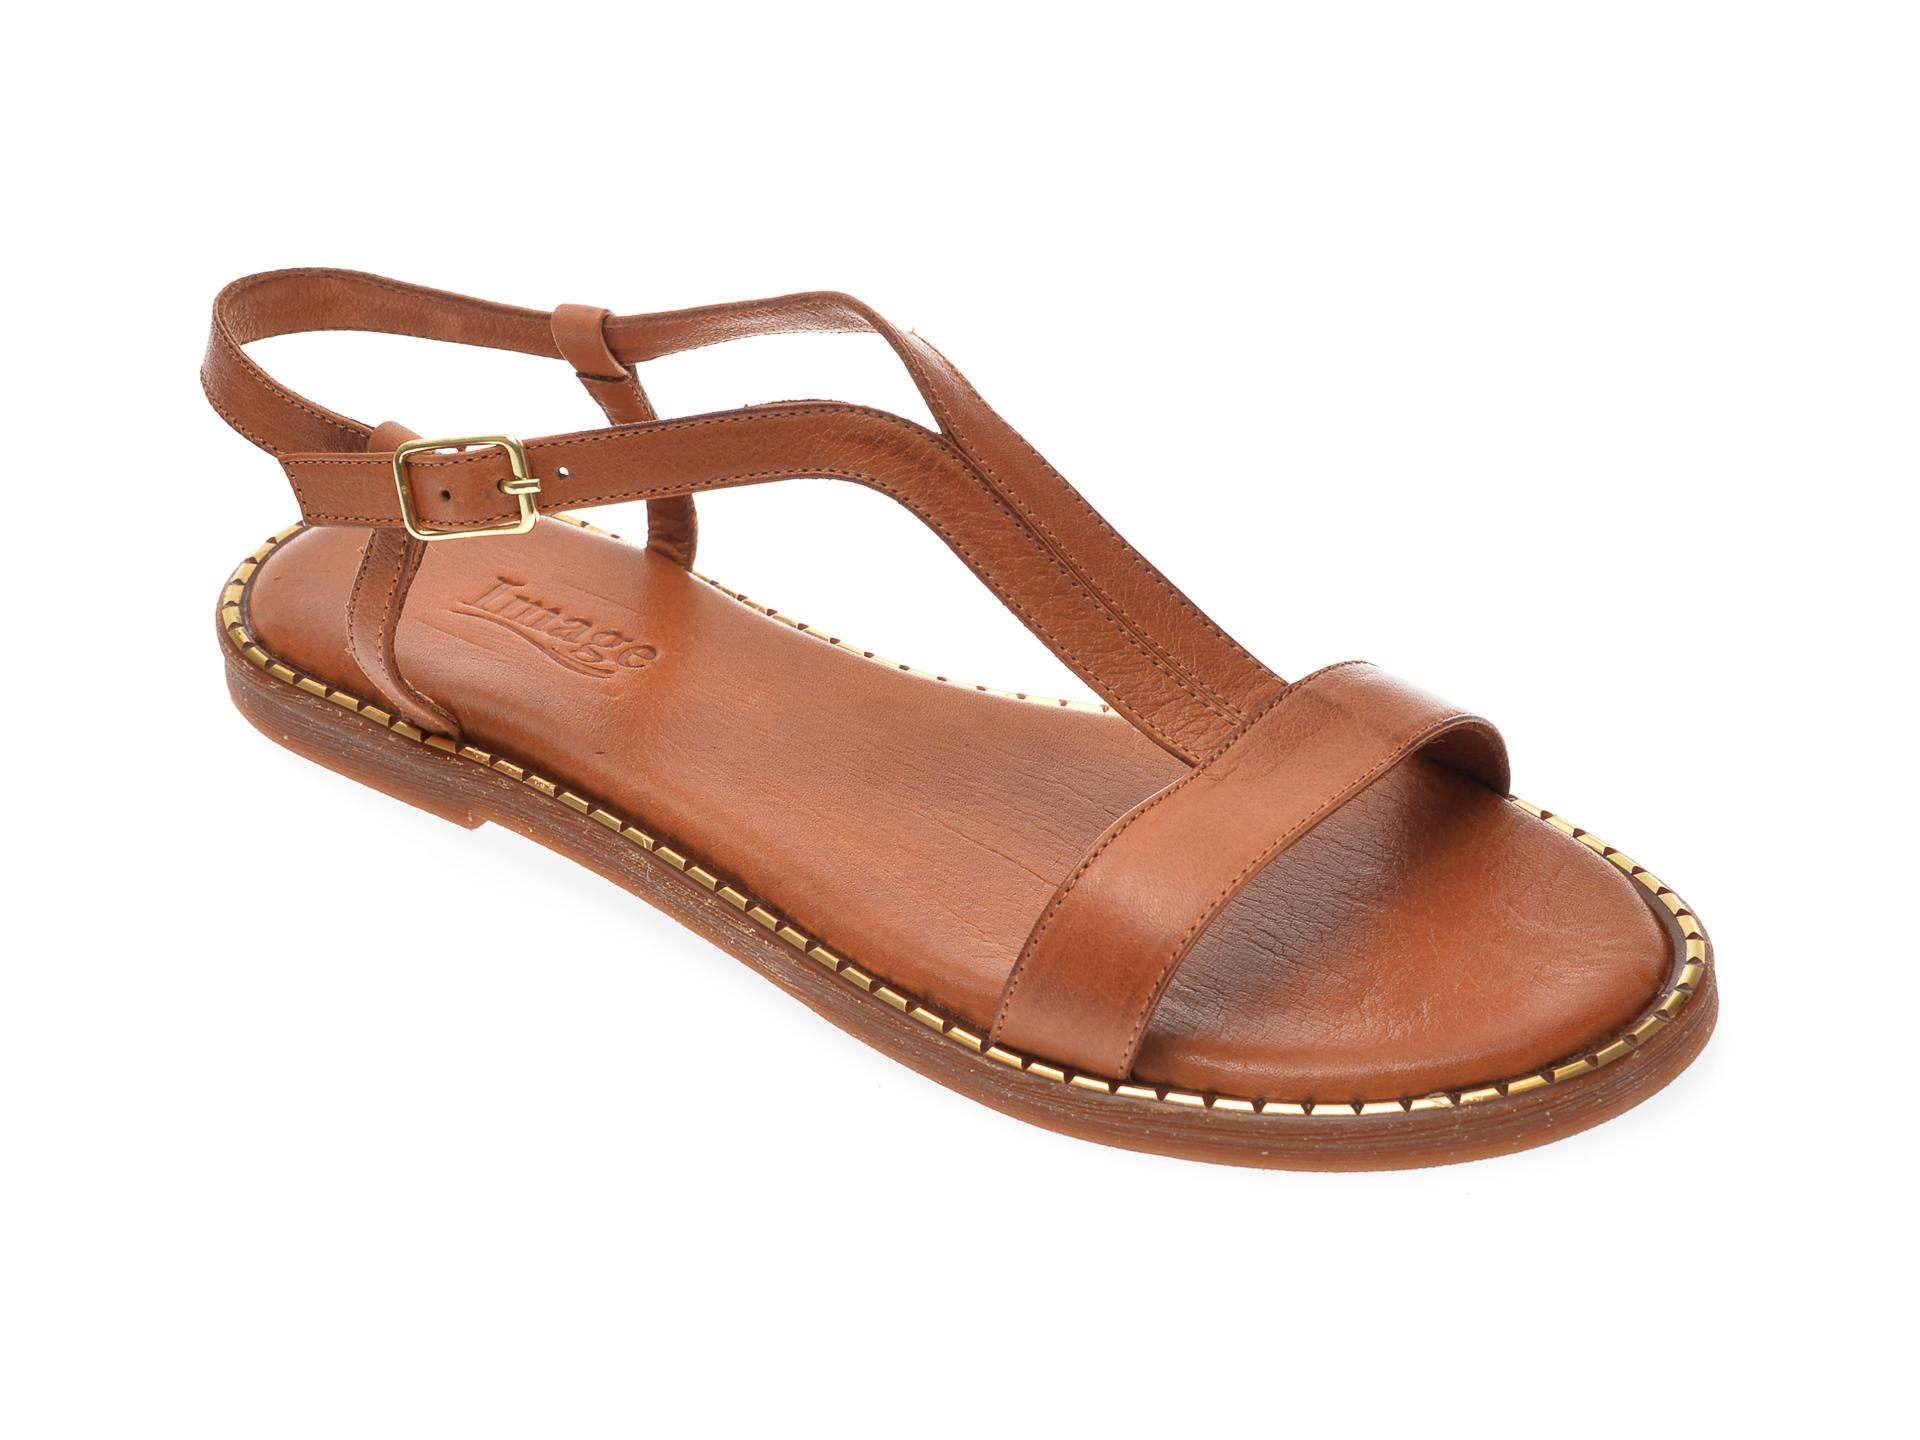 Sandale IMAGE maro, 701, din piele naturala imagine otter.ro 2021